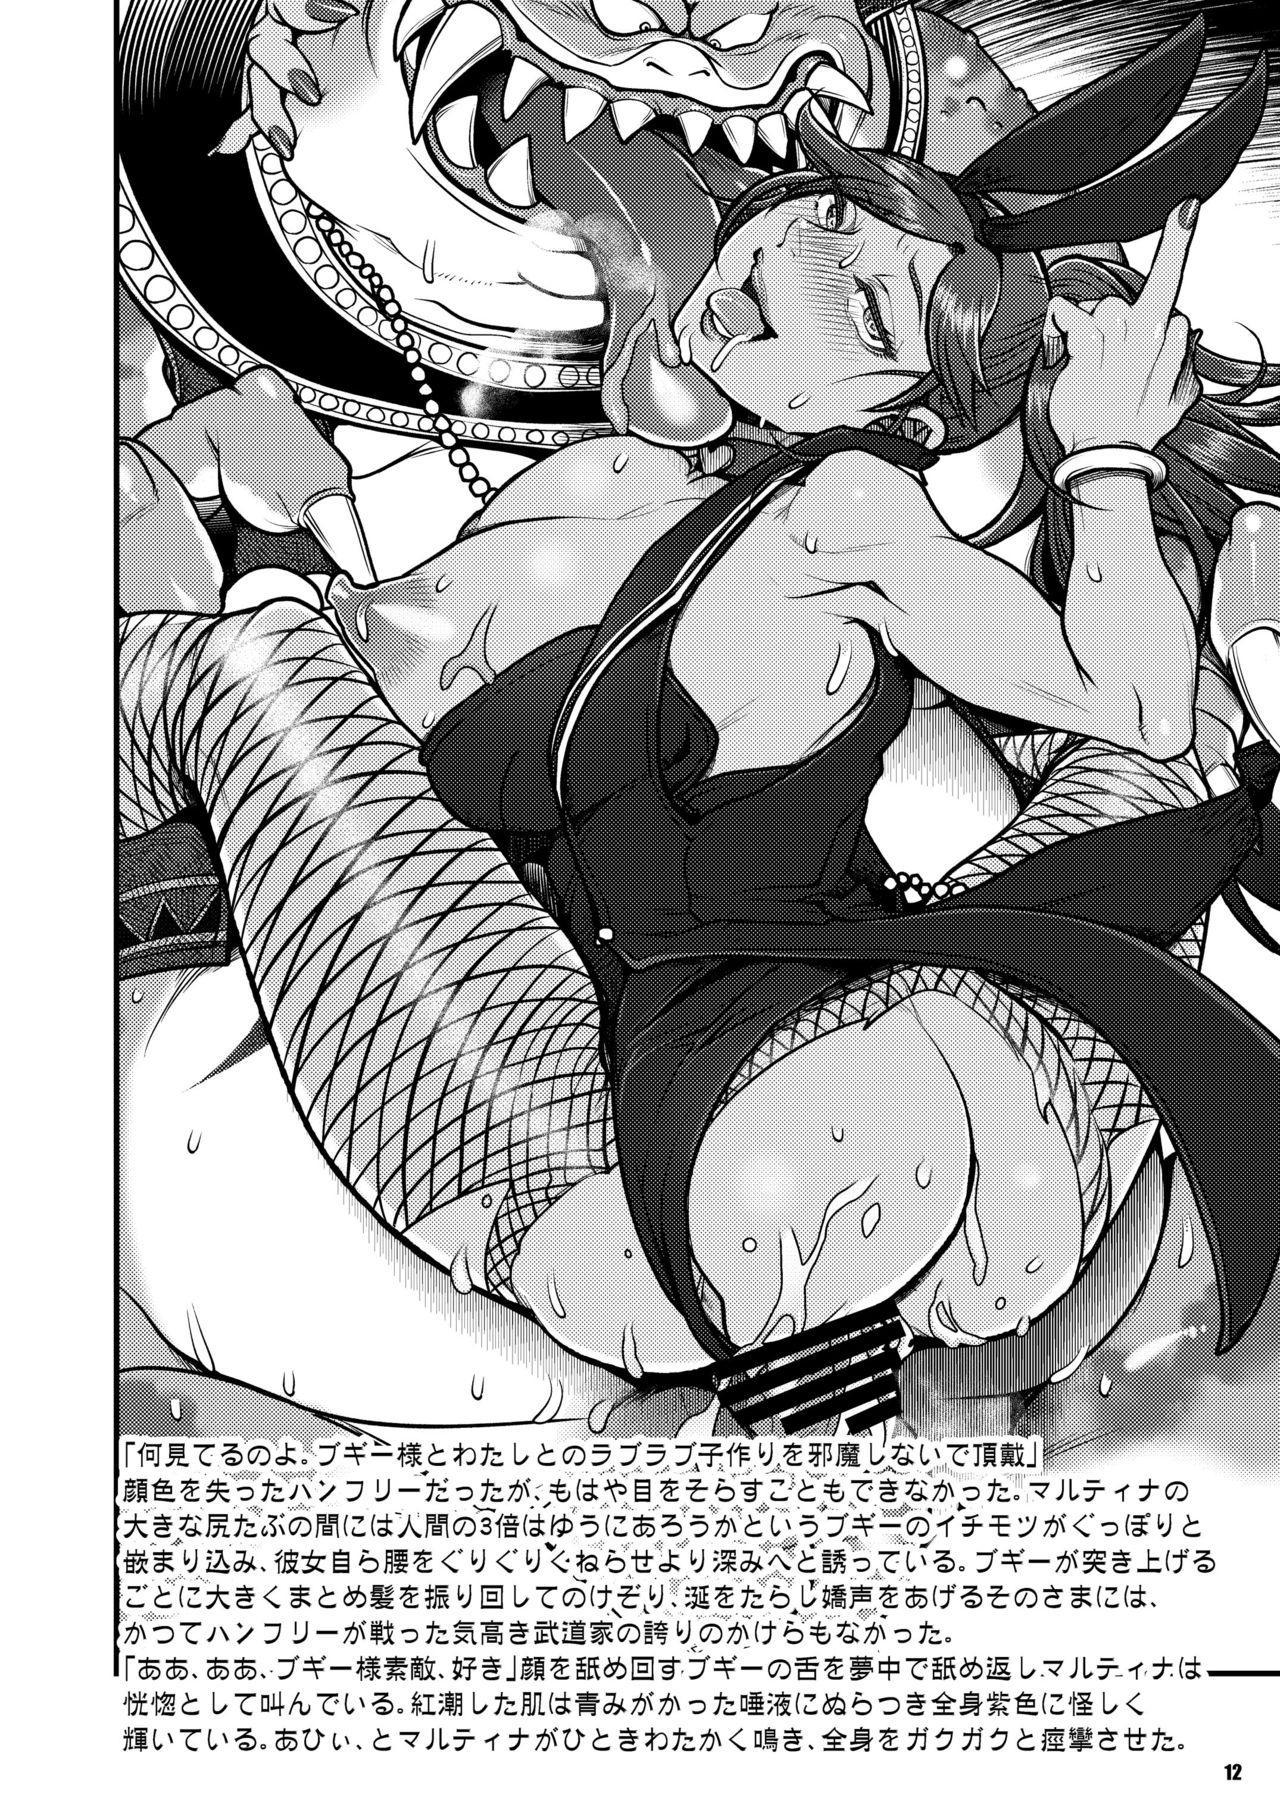 DQ Series Illust & SS Shuu 11